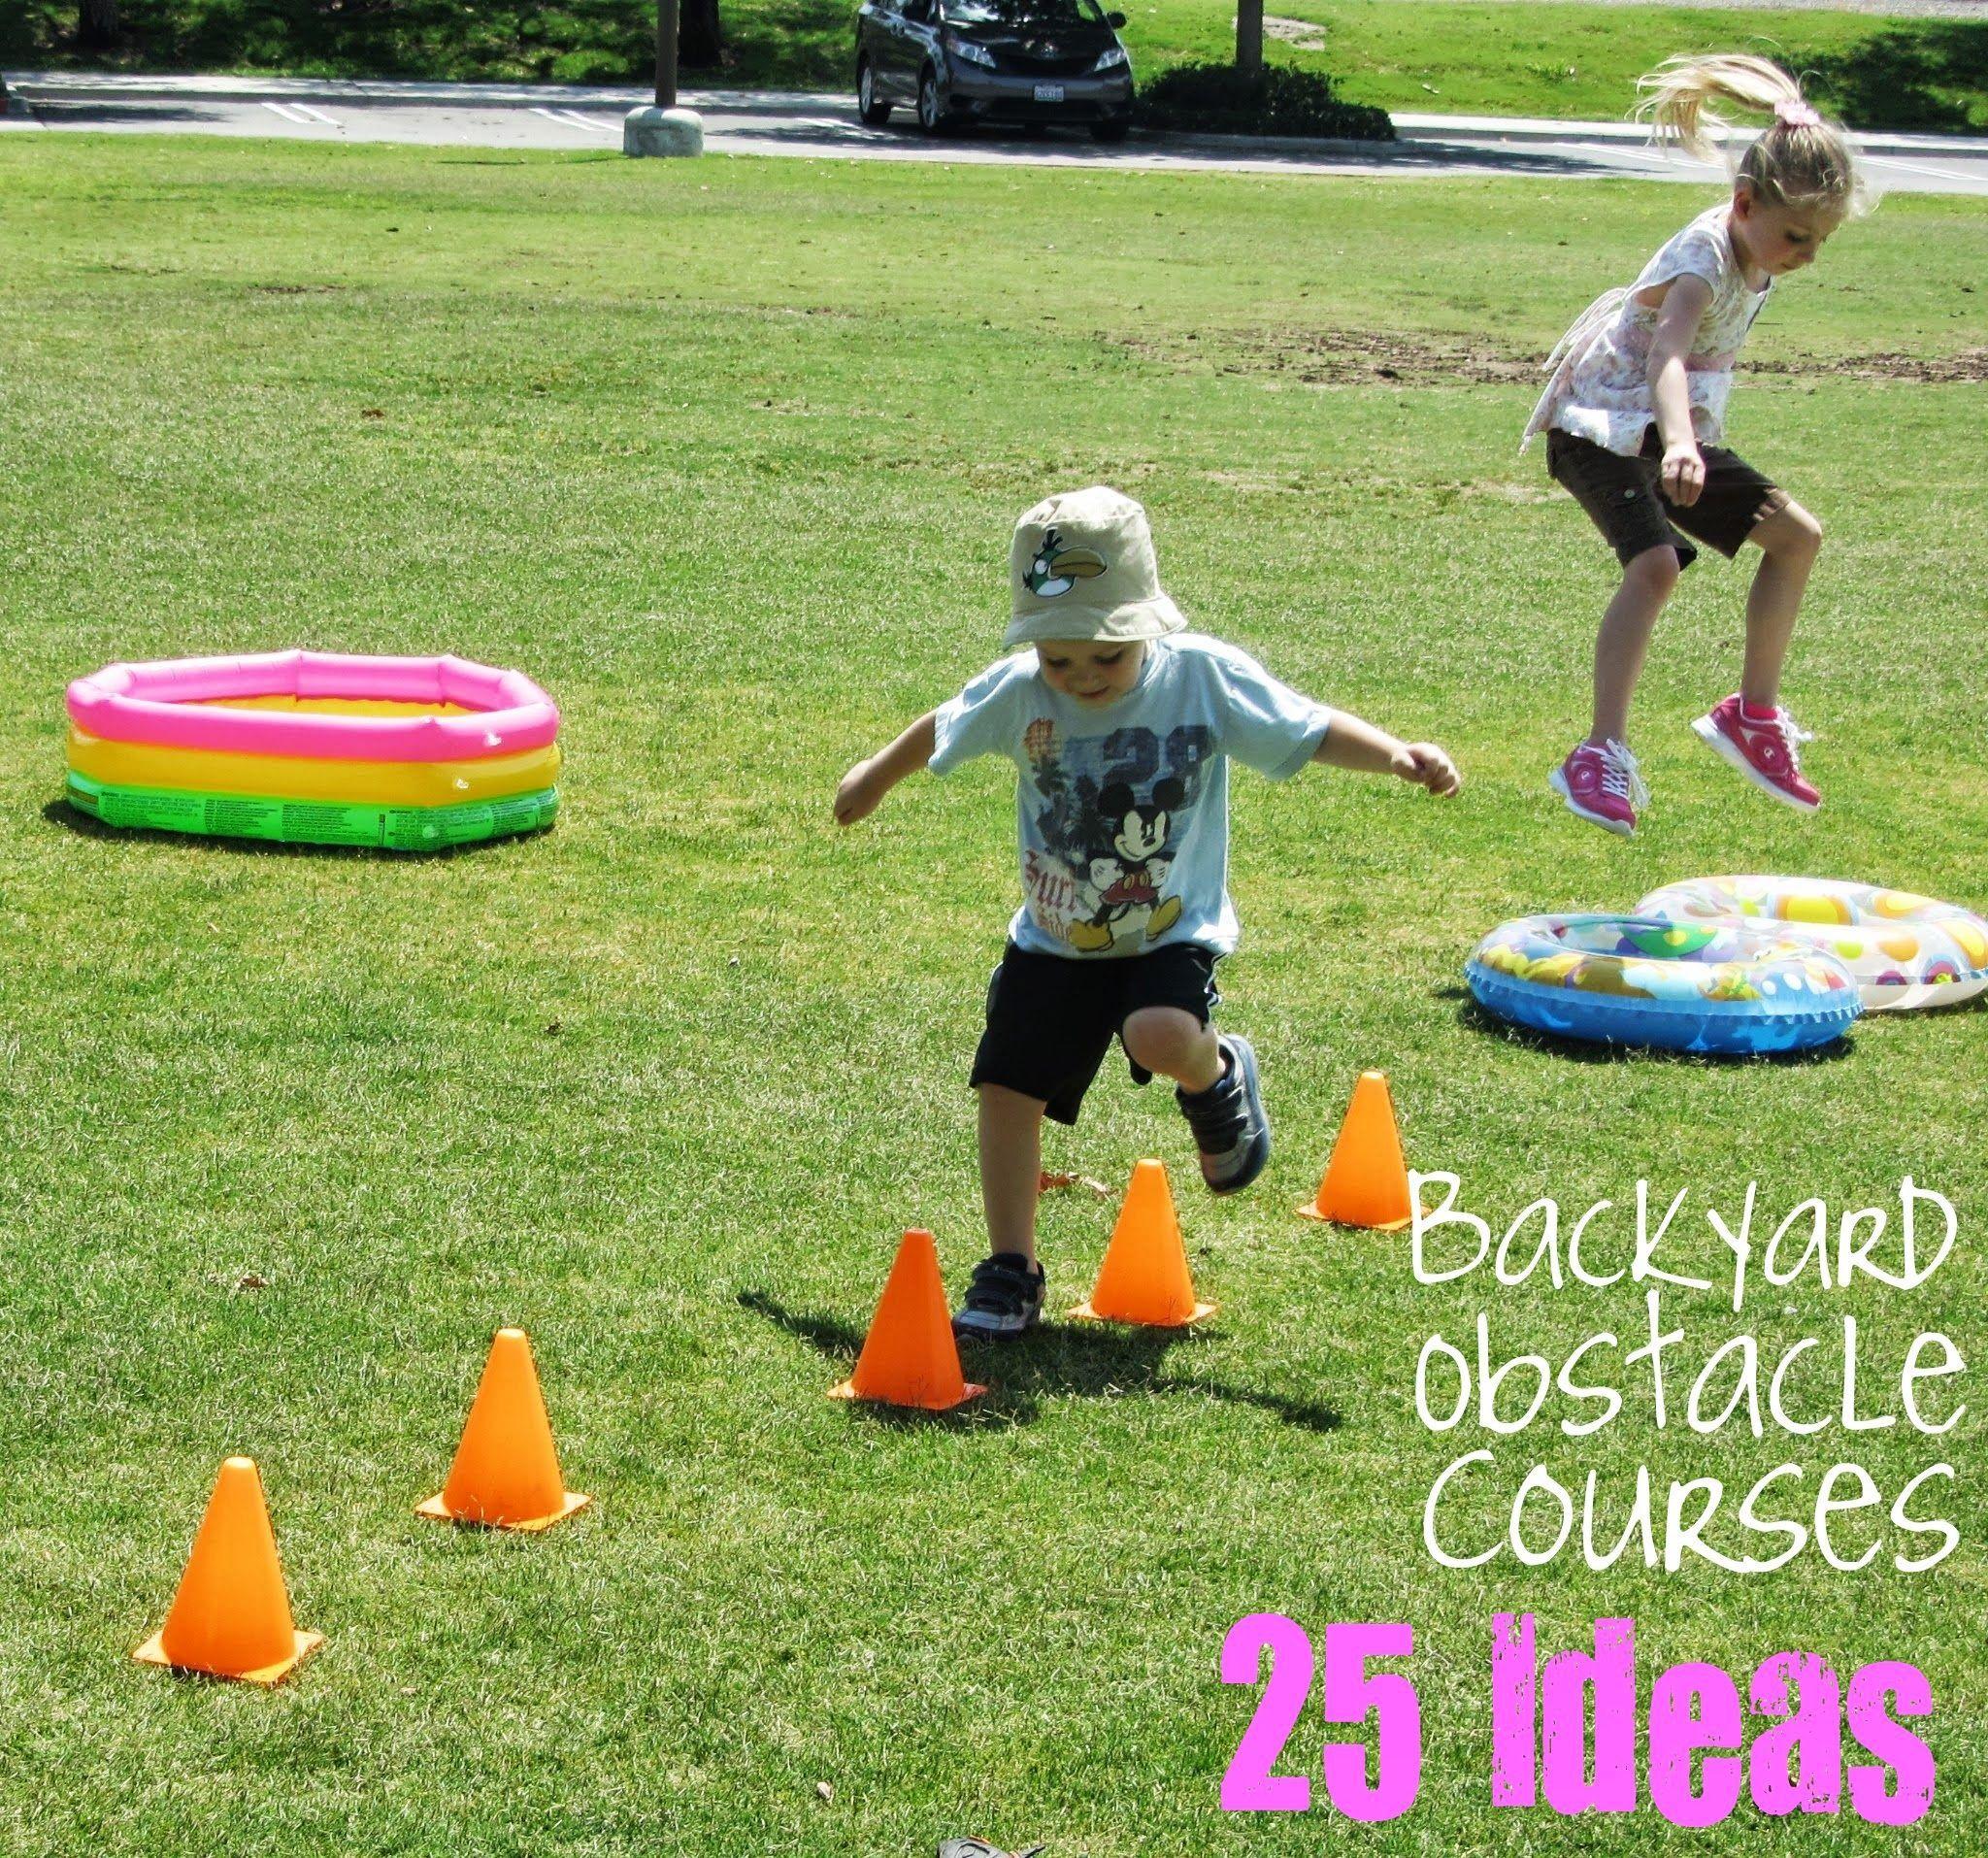 Resultado de imagen de Make A Kids Obstacle Course | Kids obstacle course,  Outdoor fun for kids, Backyard obstacle course